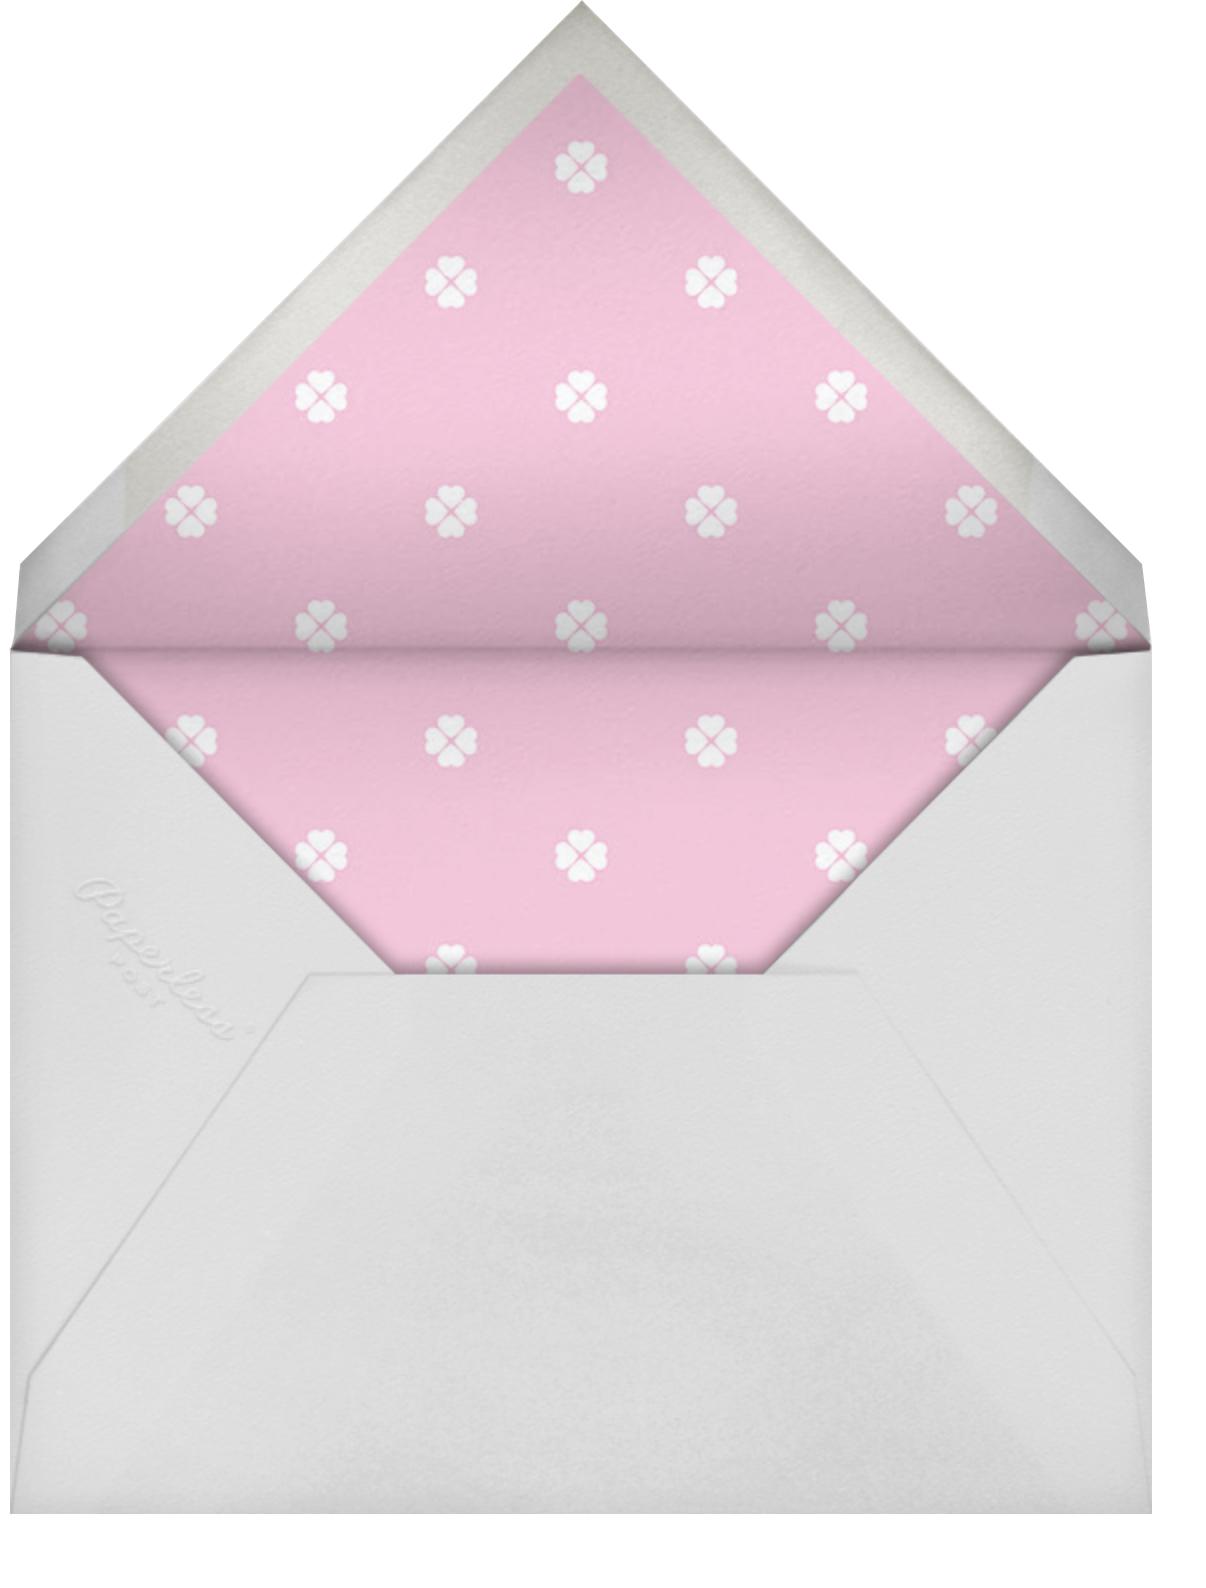 Two Halves - Paella/Pavlova - kate spade new york - Book club - envelope back